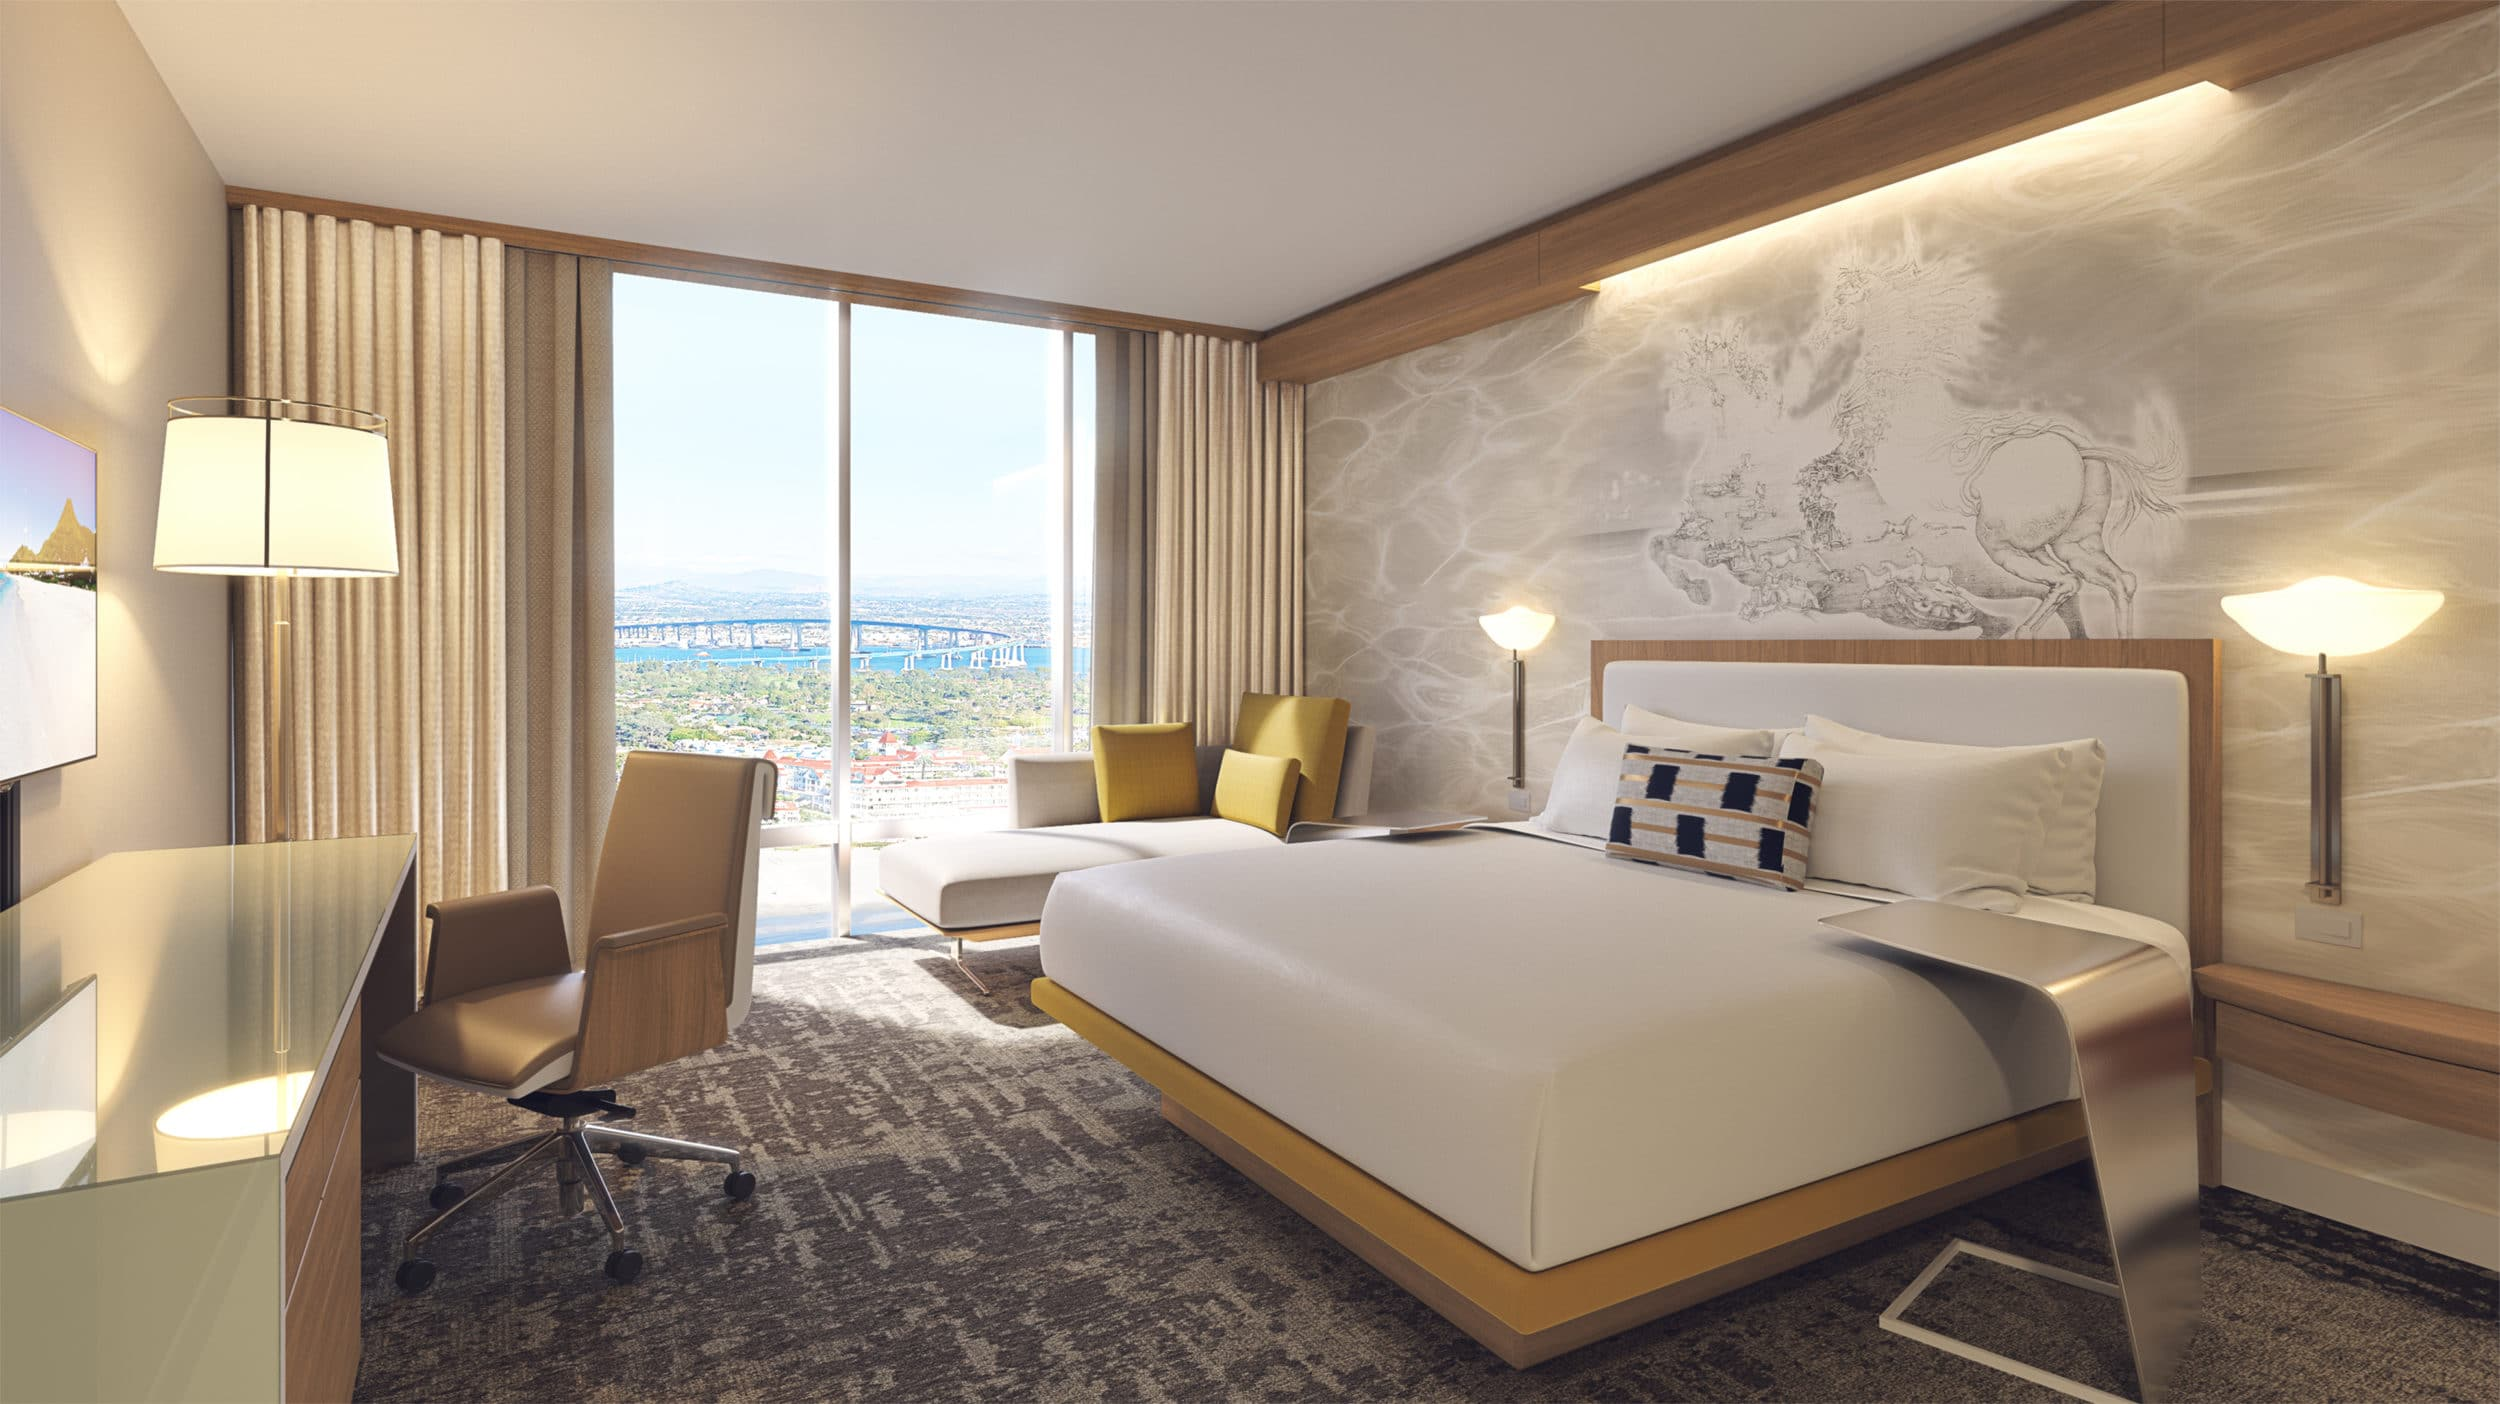 YSK Furniture modern modern apartment furniture inquire now star room-1